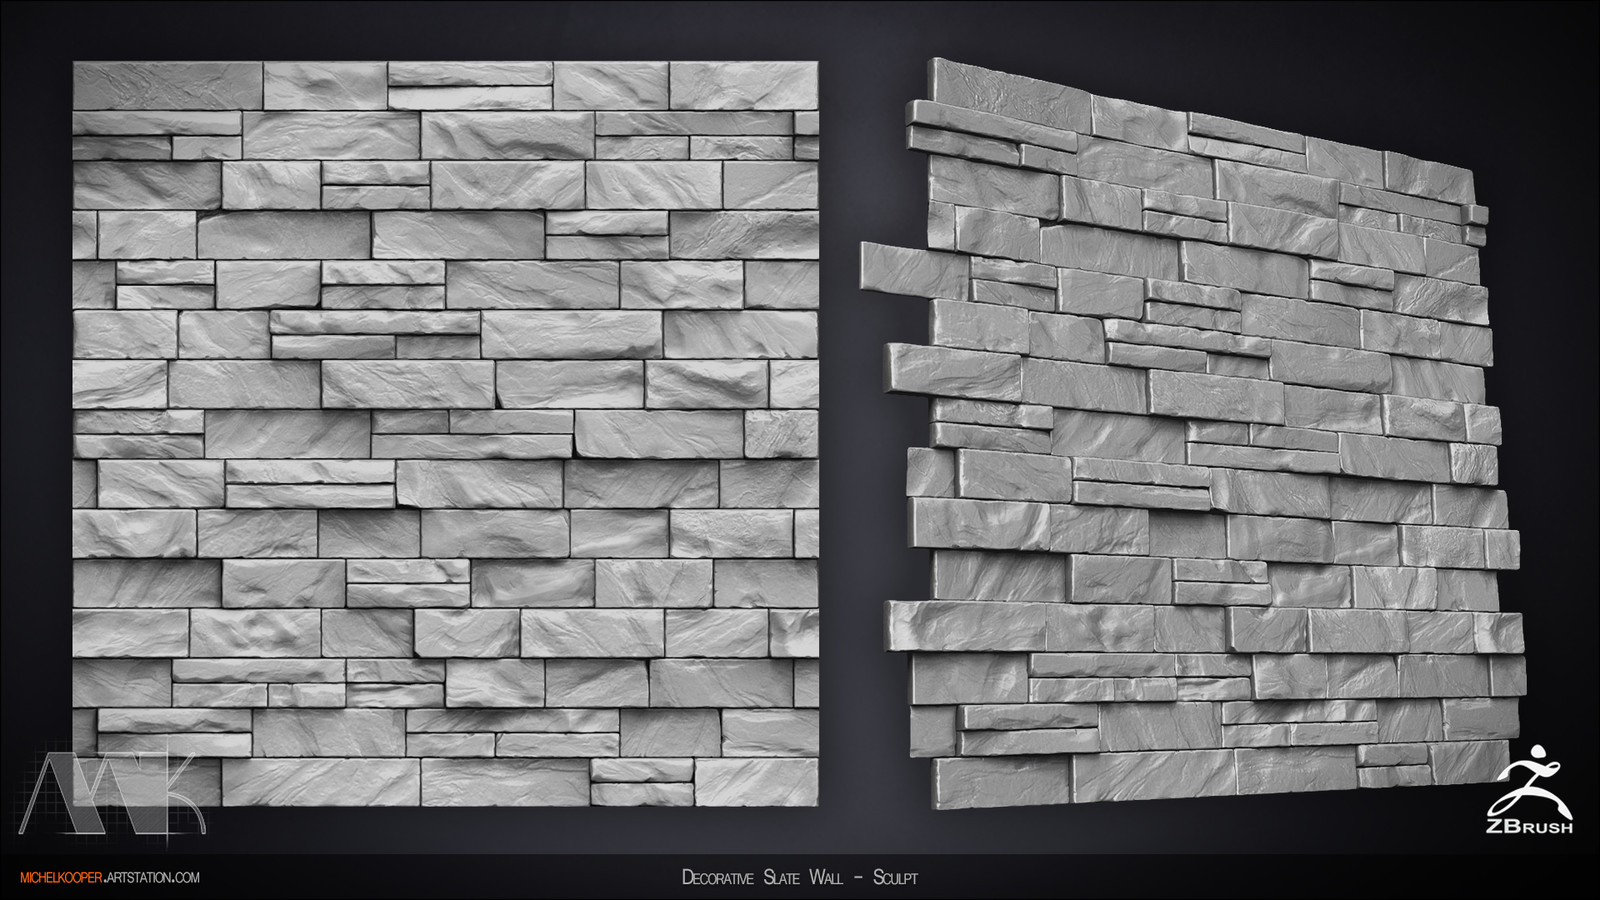 Decorative Slate Wall - Sculpt